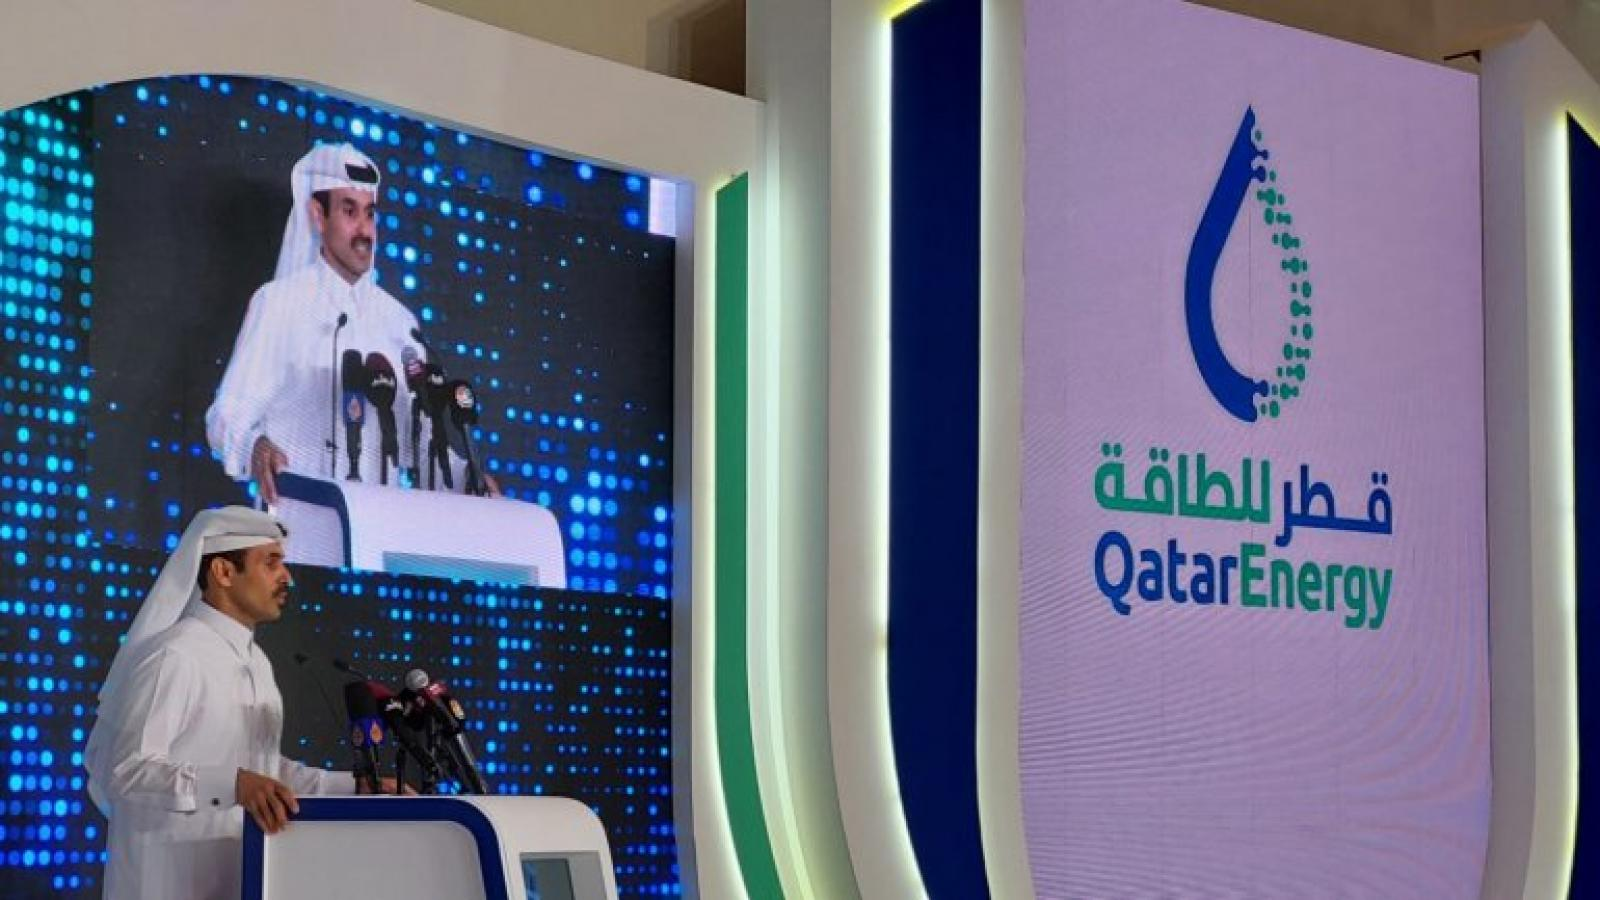 Qatar Petroleum officially rebrands as QatarEnergy